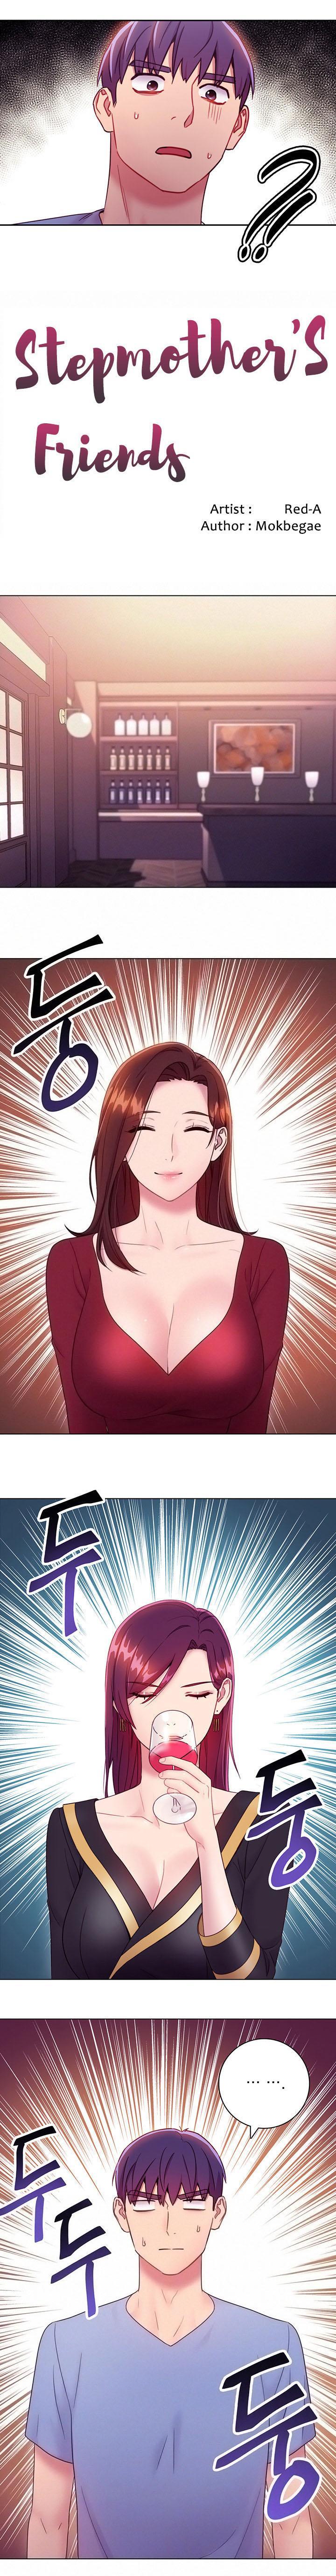 [Neck Pilllow] Stepmother Friends Ch.39/? [English] [Hentai Universe] NEW! 13/10/2020 327